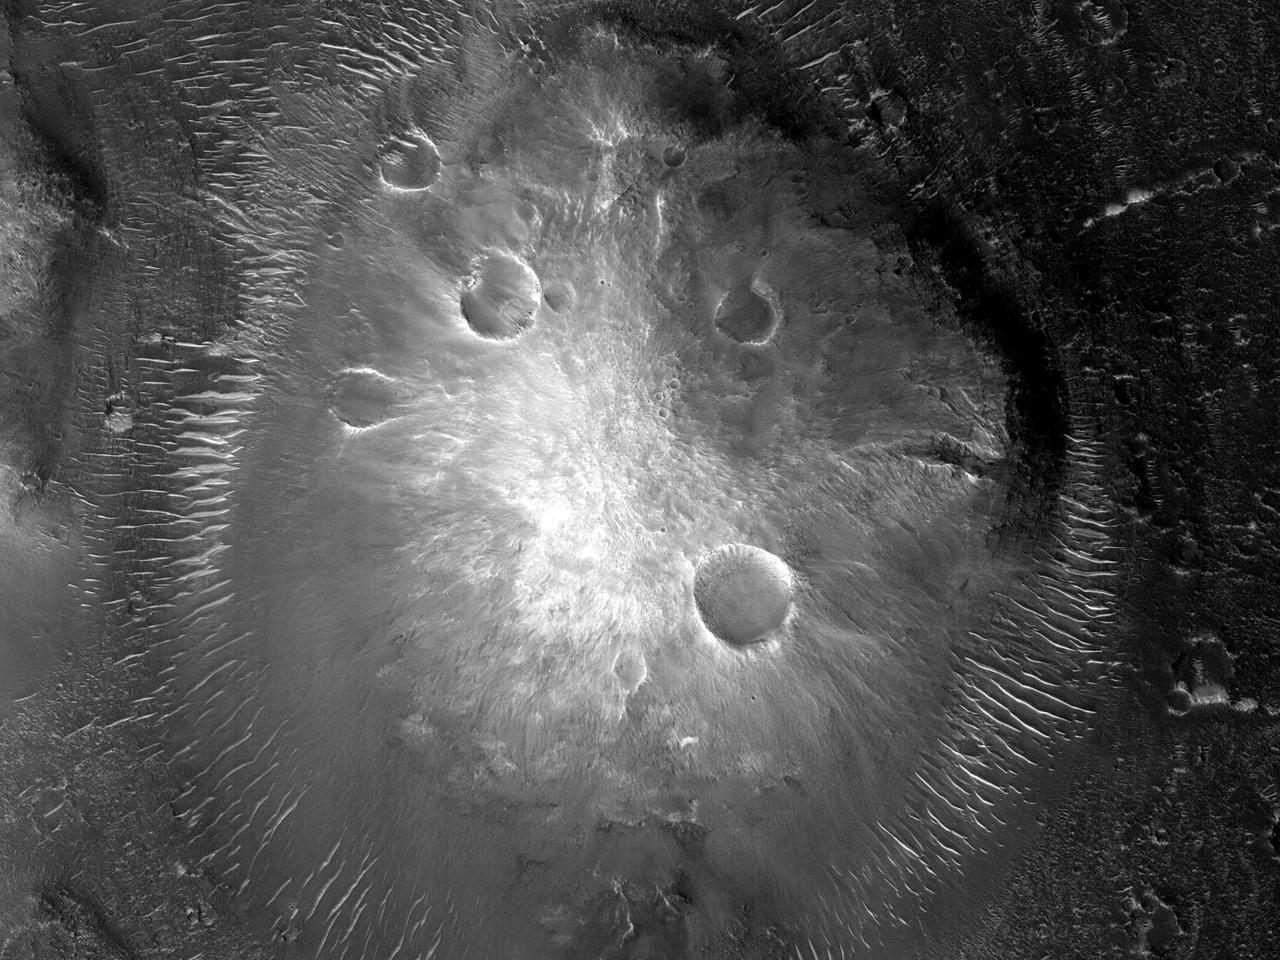 Stor haug og sanddyner i Mawrth Vallis